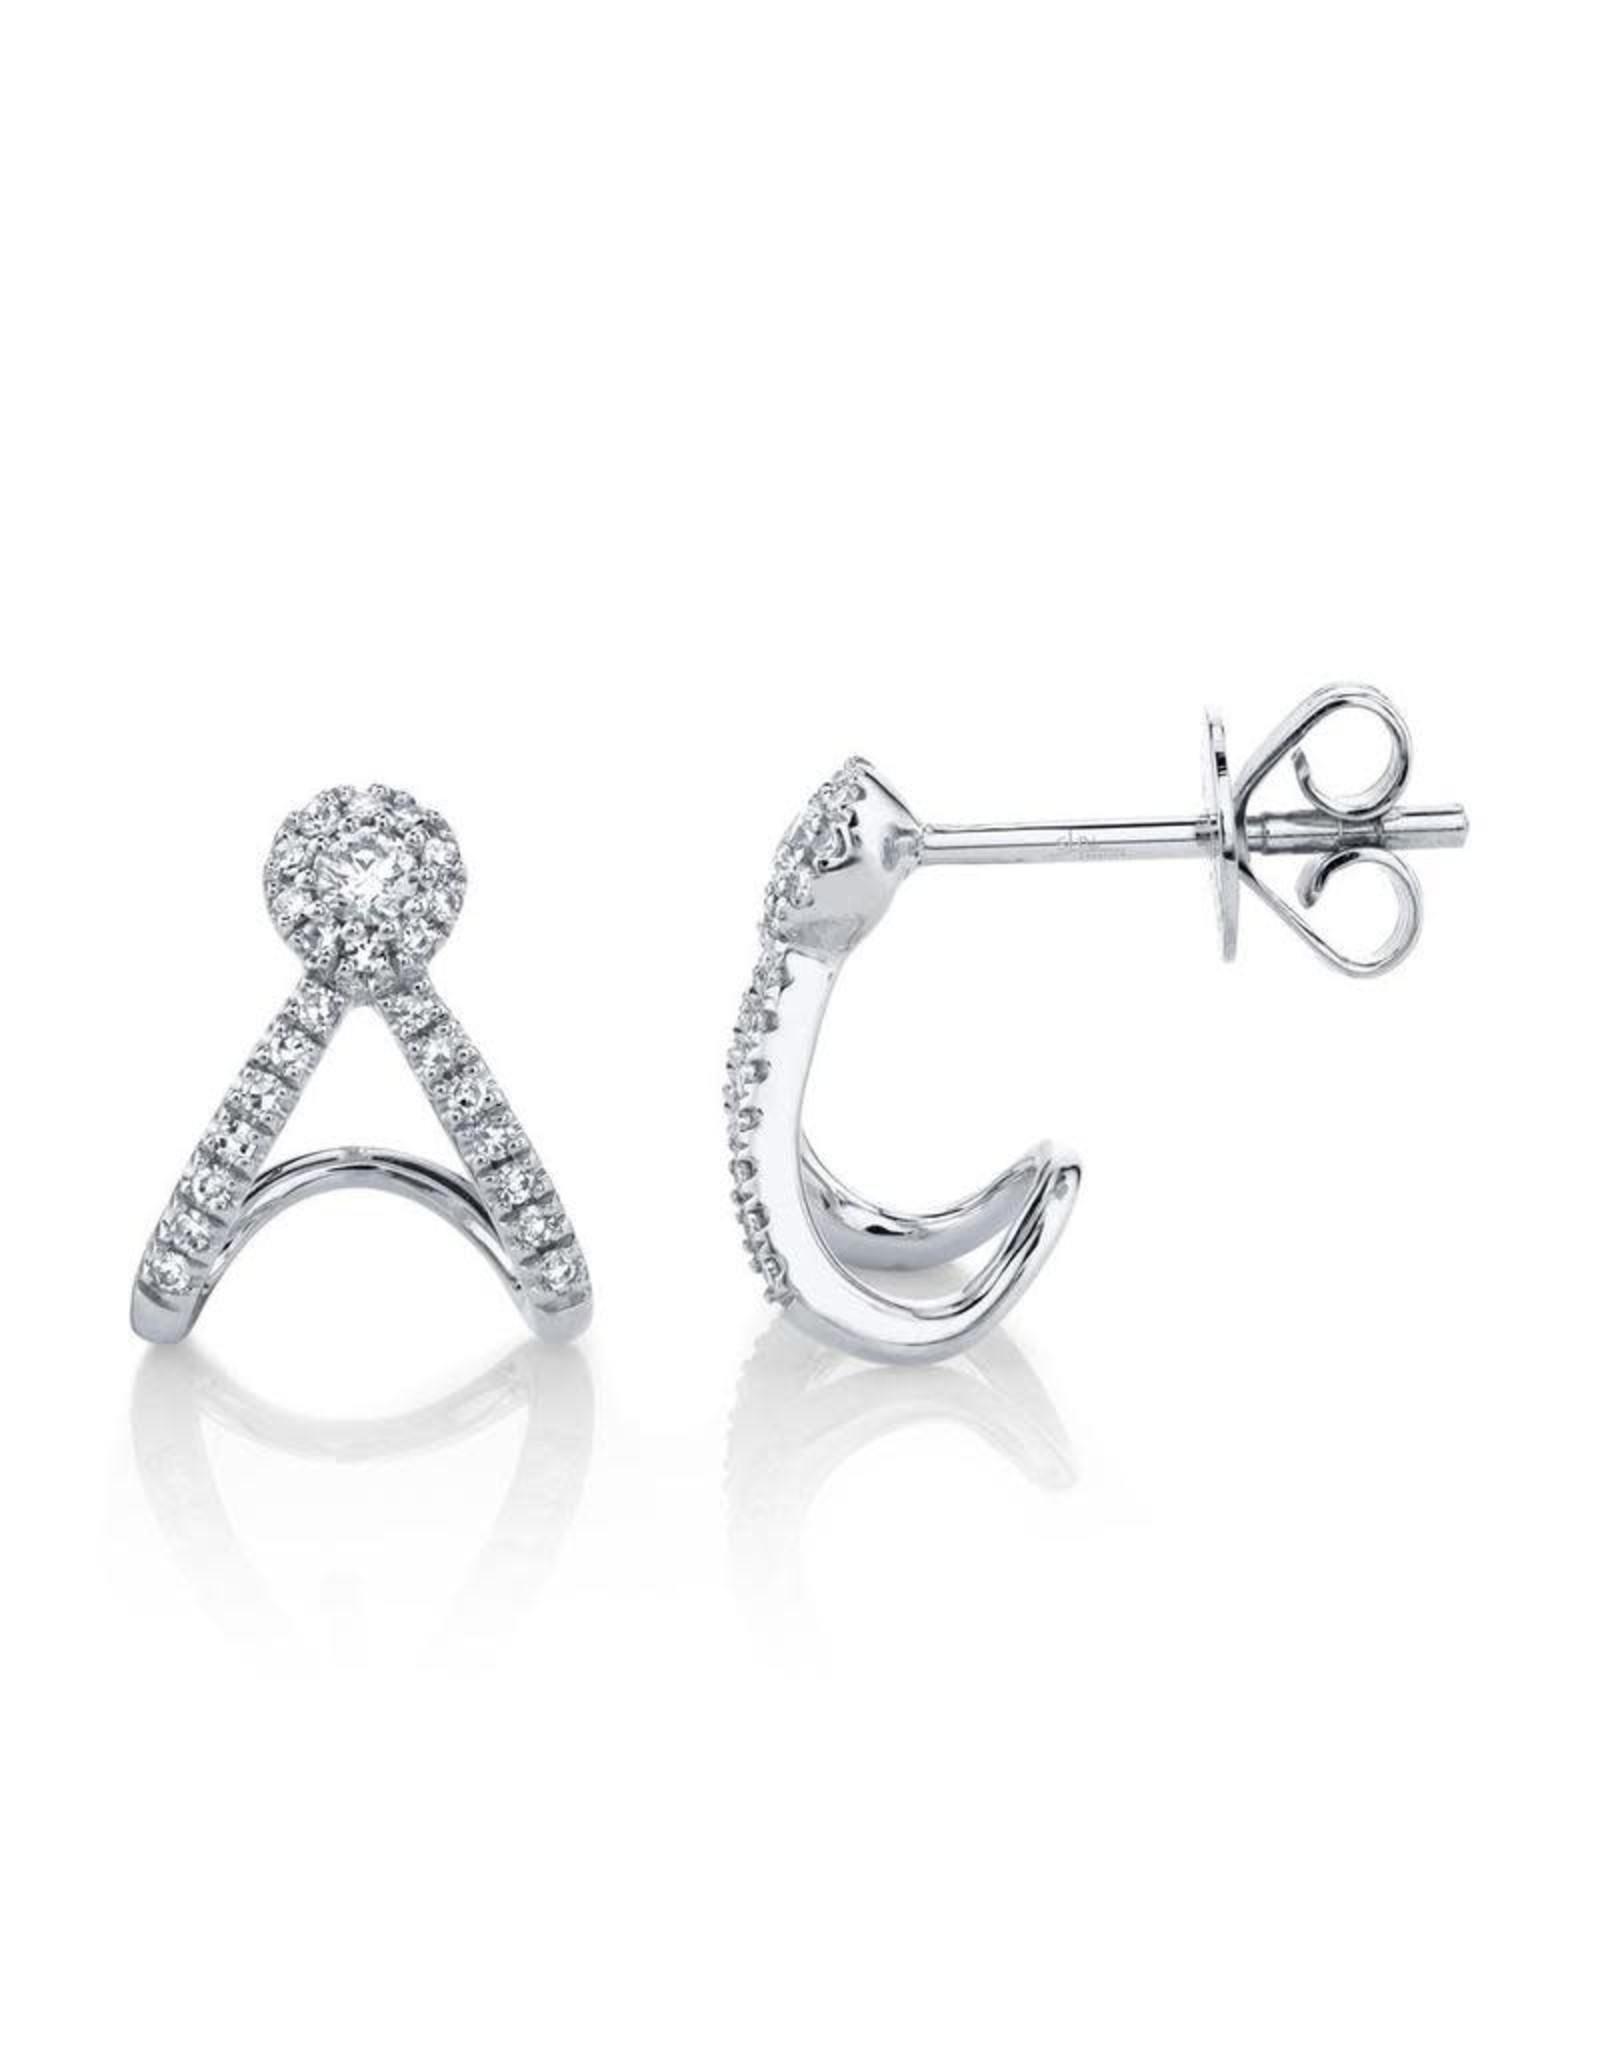 14K White Gold Diamond Earring Cuffs, D: 0.20ct